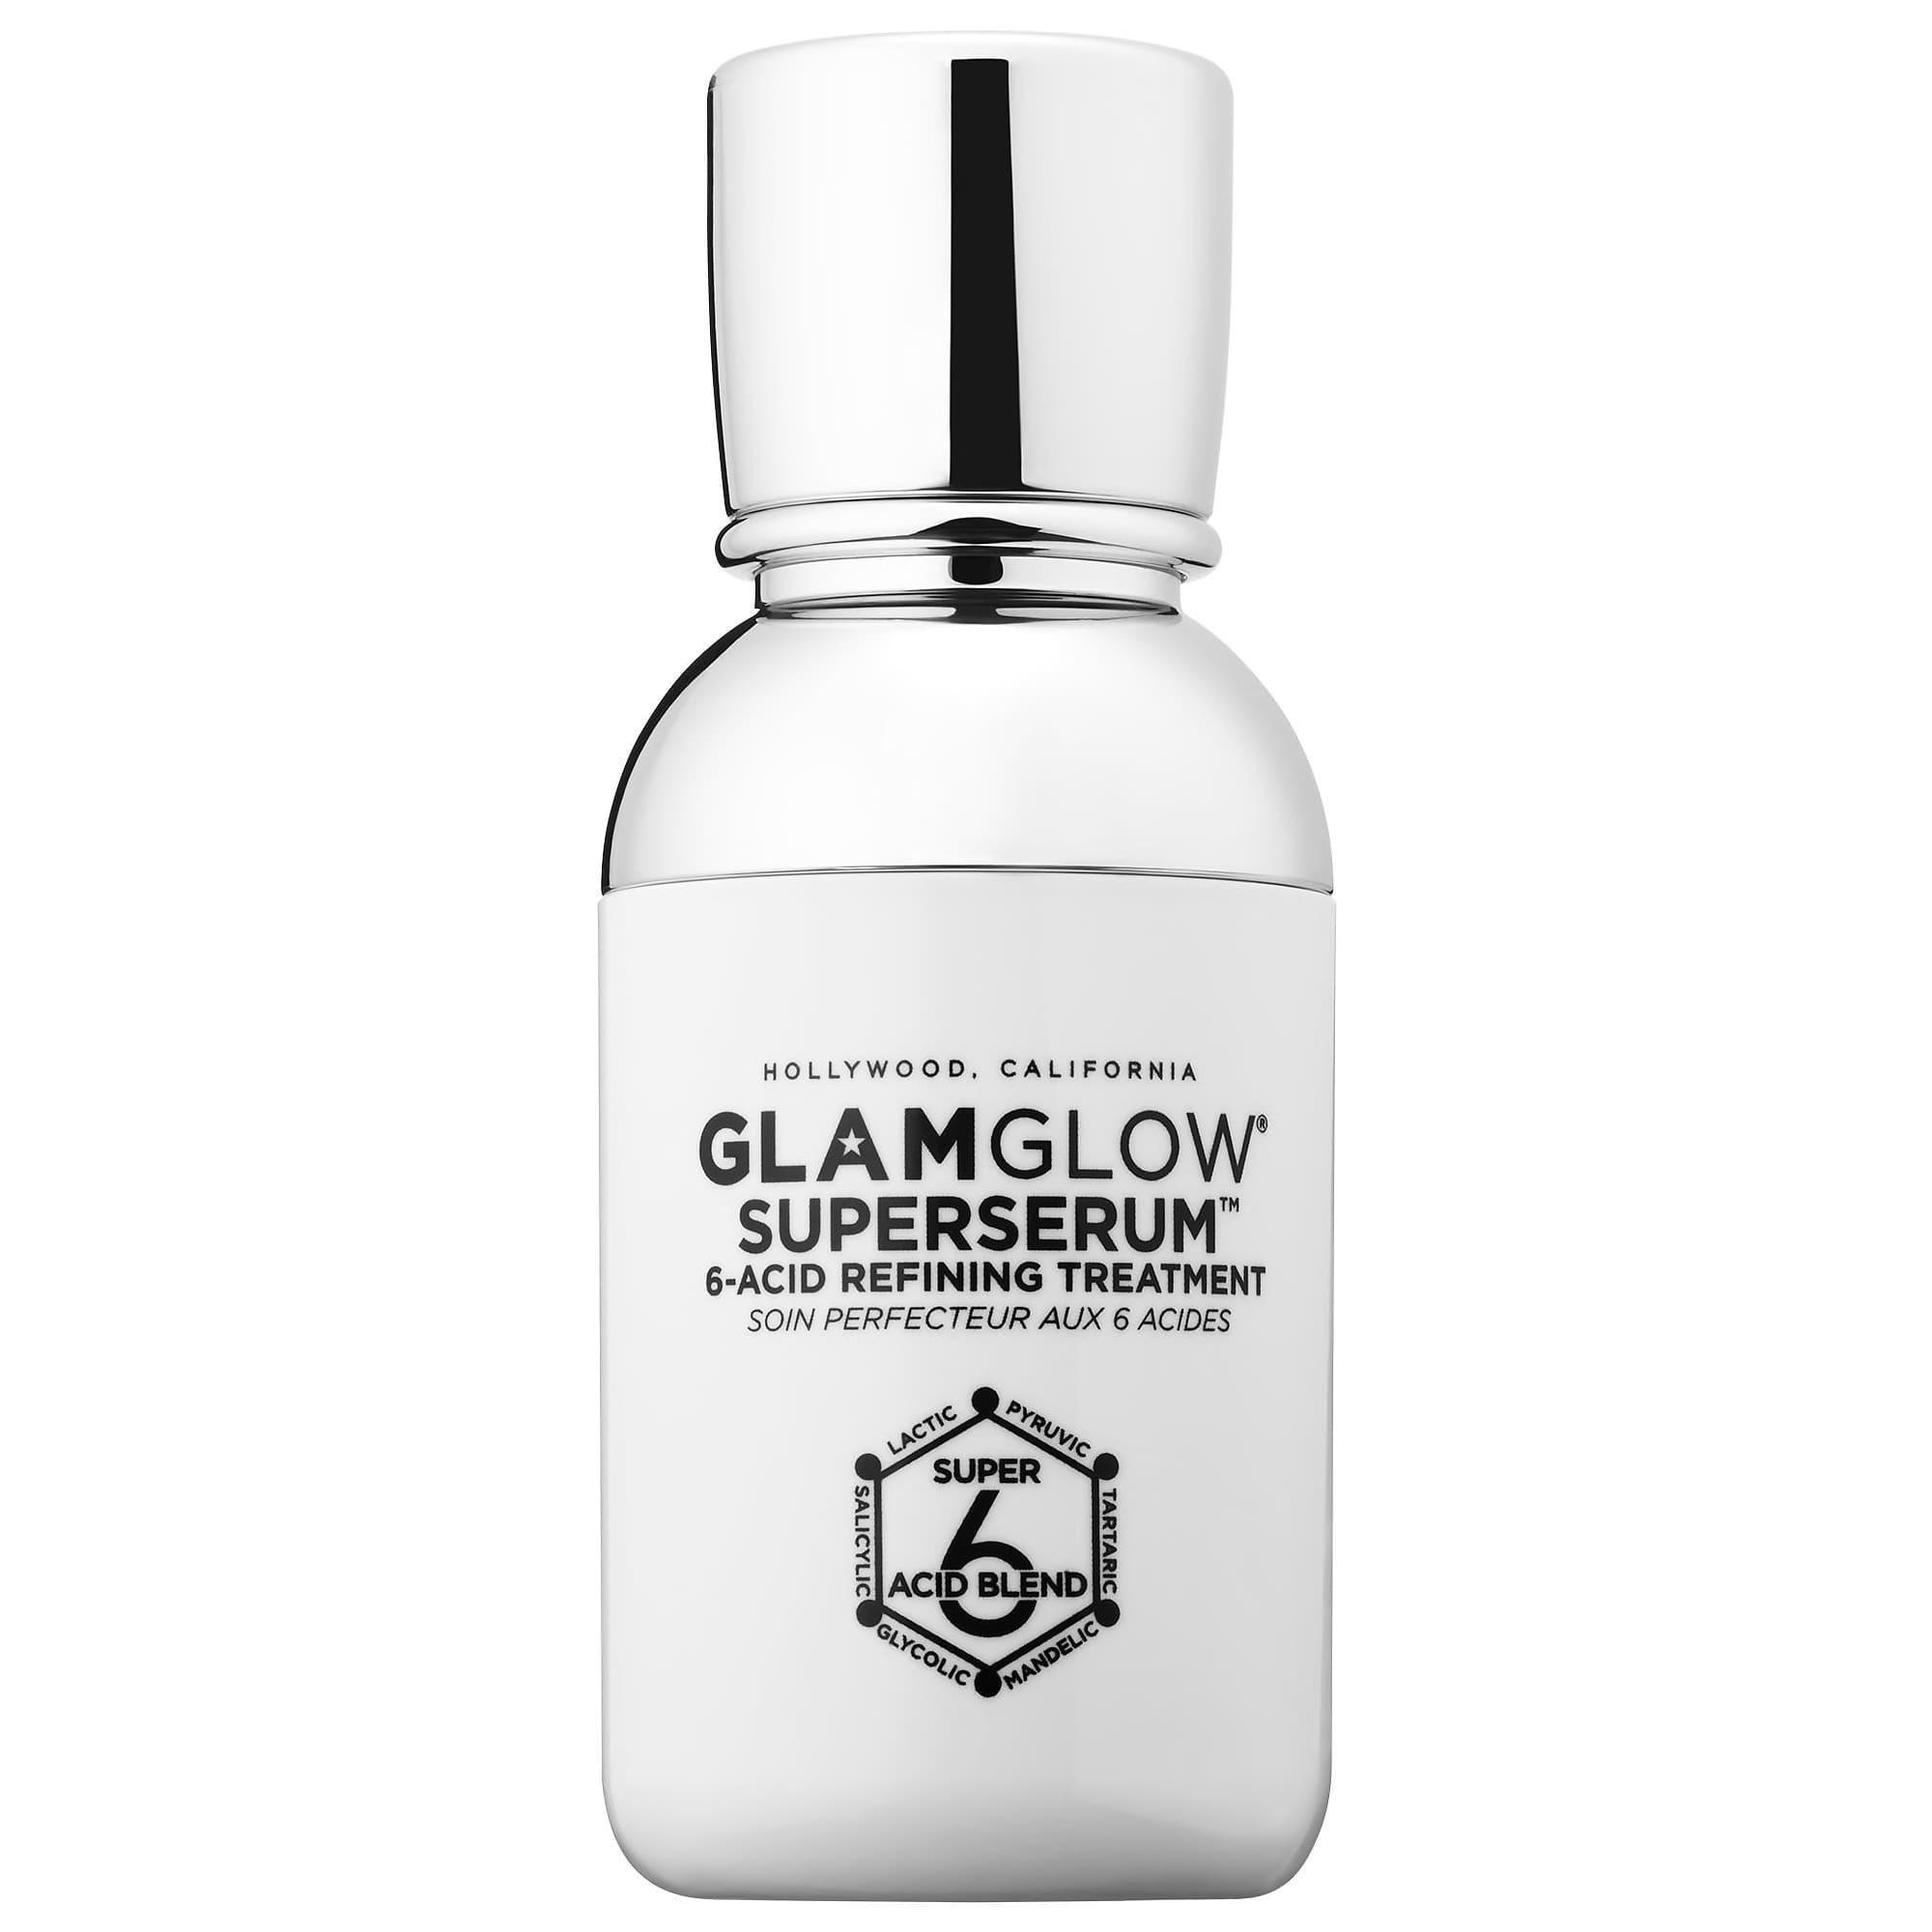 Glamglow Superserum 6-Acid Refining Treatment Serum